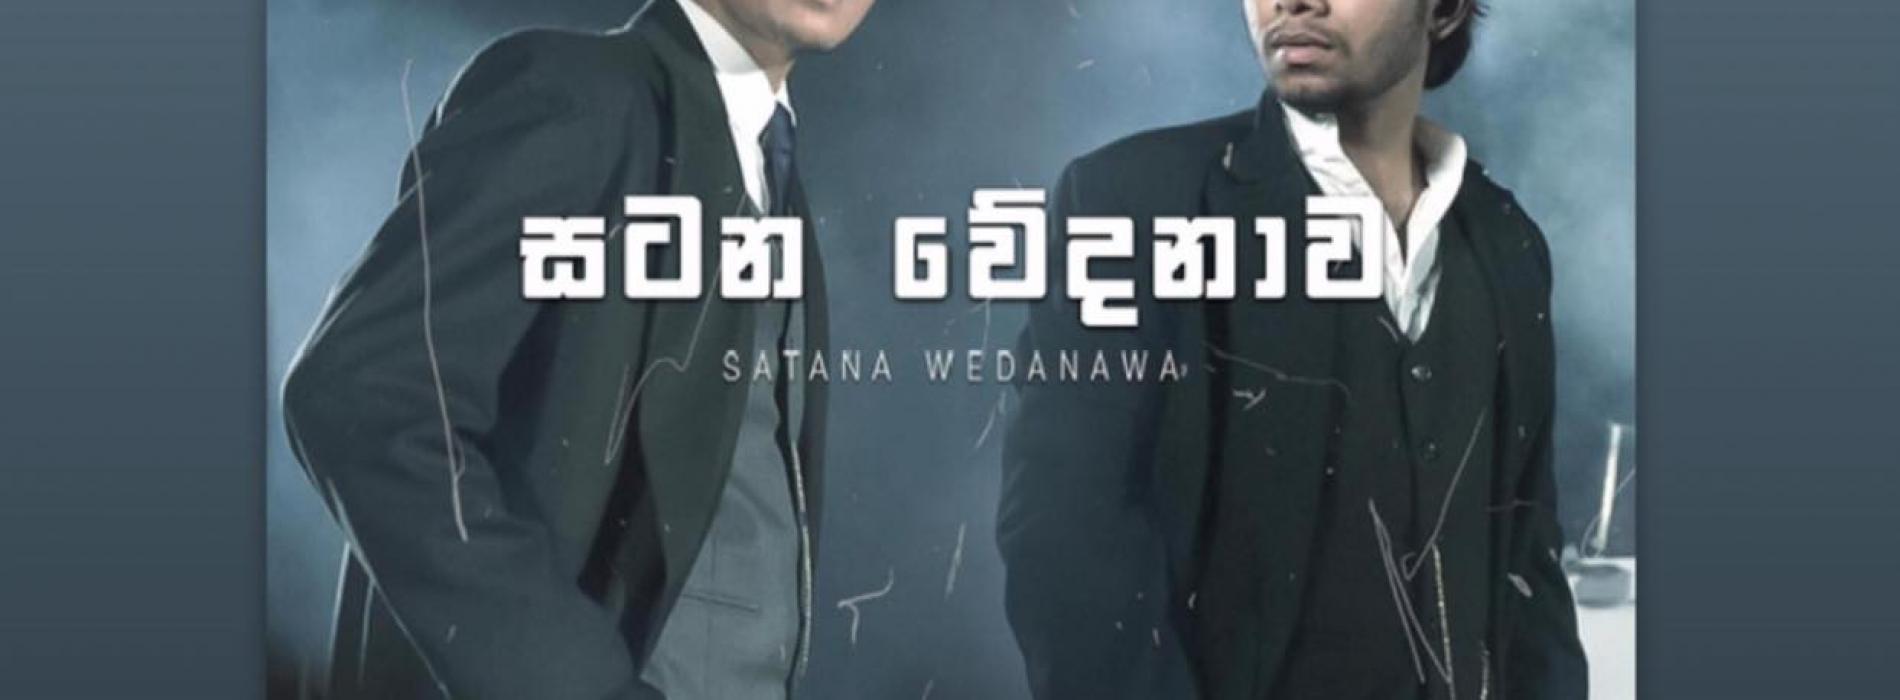 New Music : Satana Wedanawa (සටන වේදනාව) – Asel Kara | Chanuka Mora (Official Music Video)